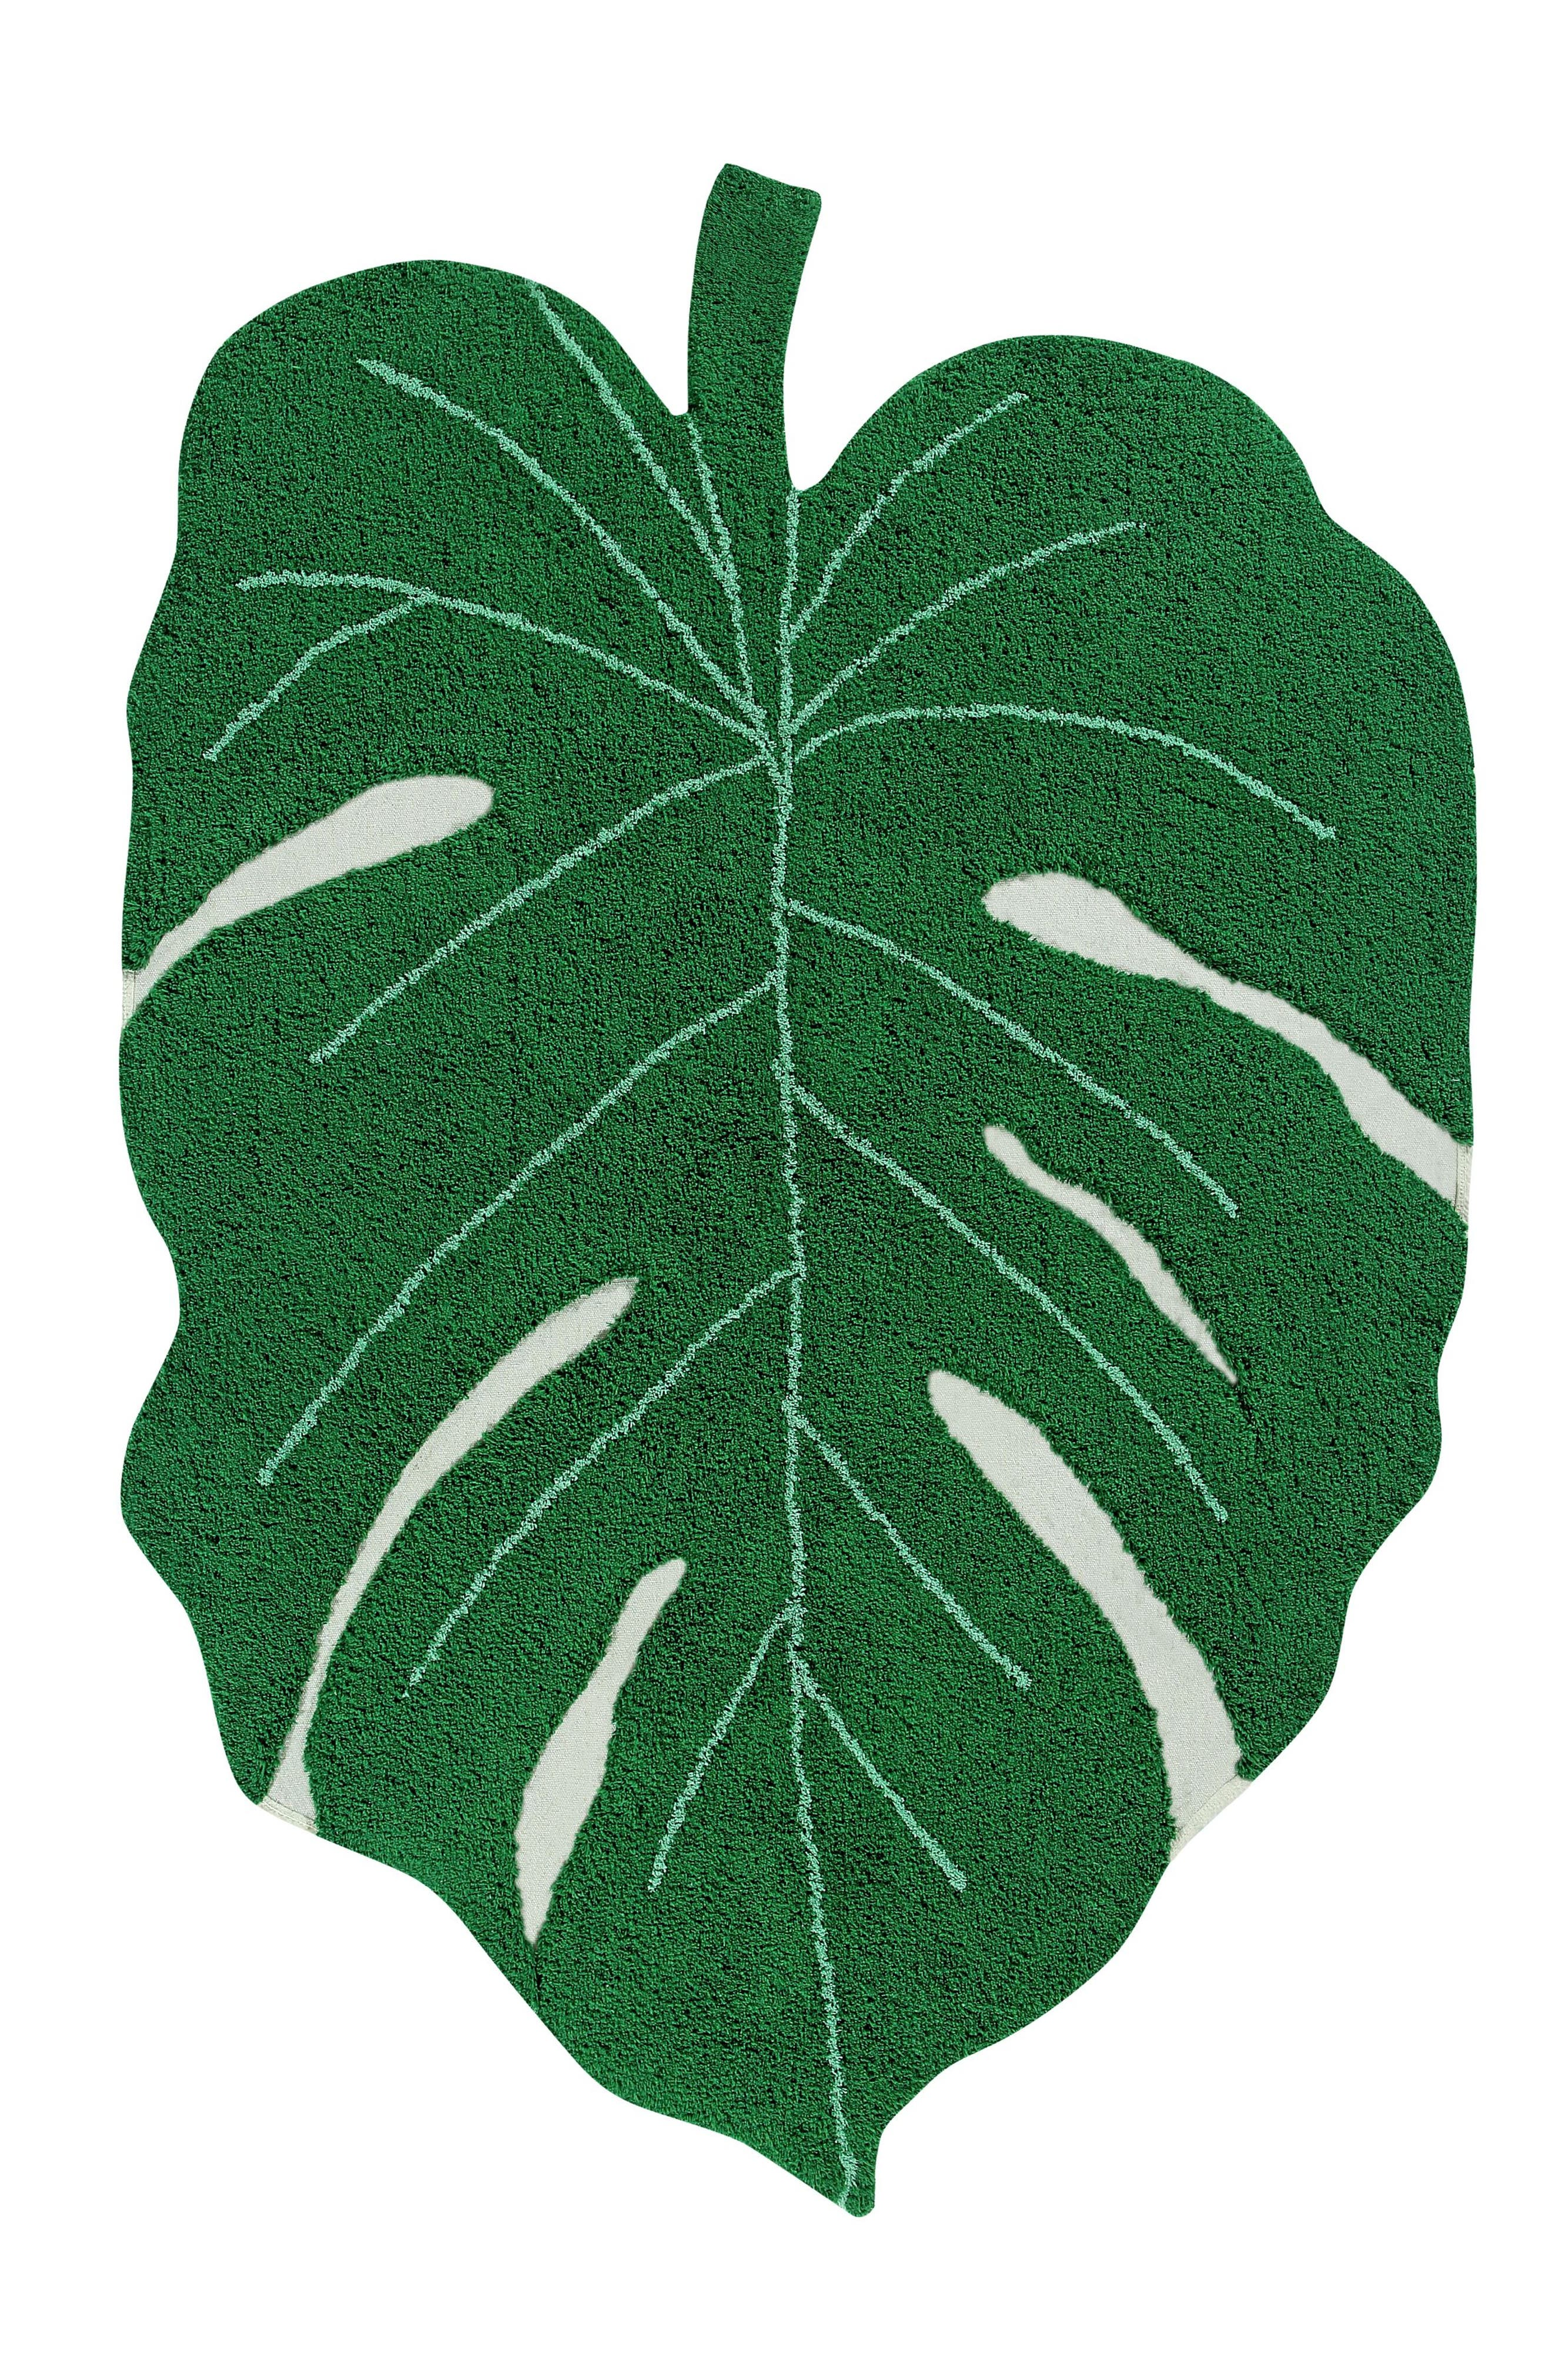 Lorena Canals Monstera Leaf Rug